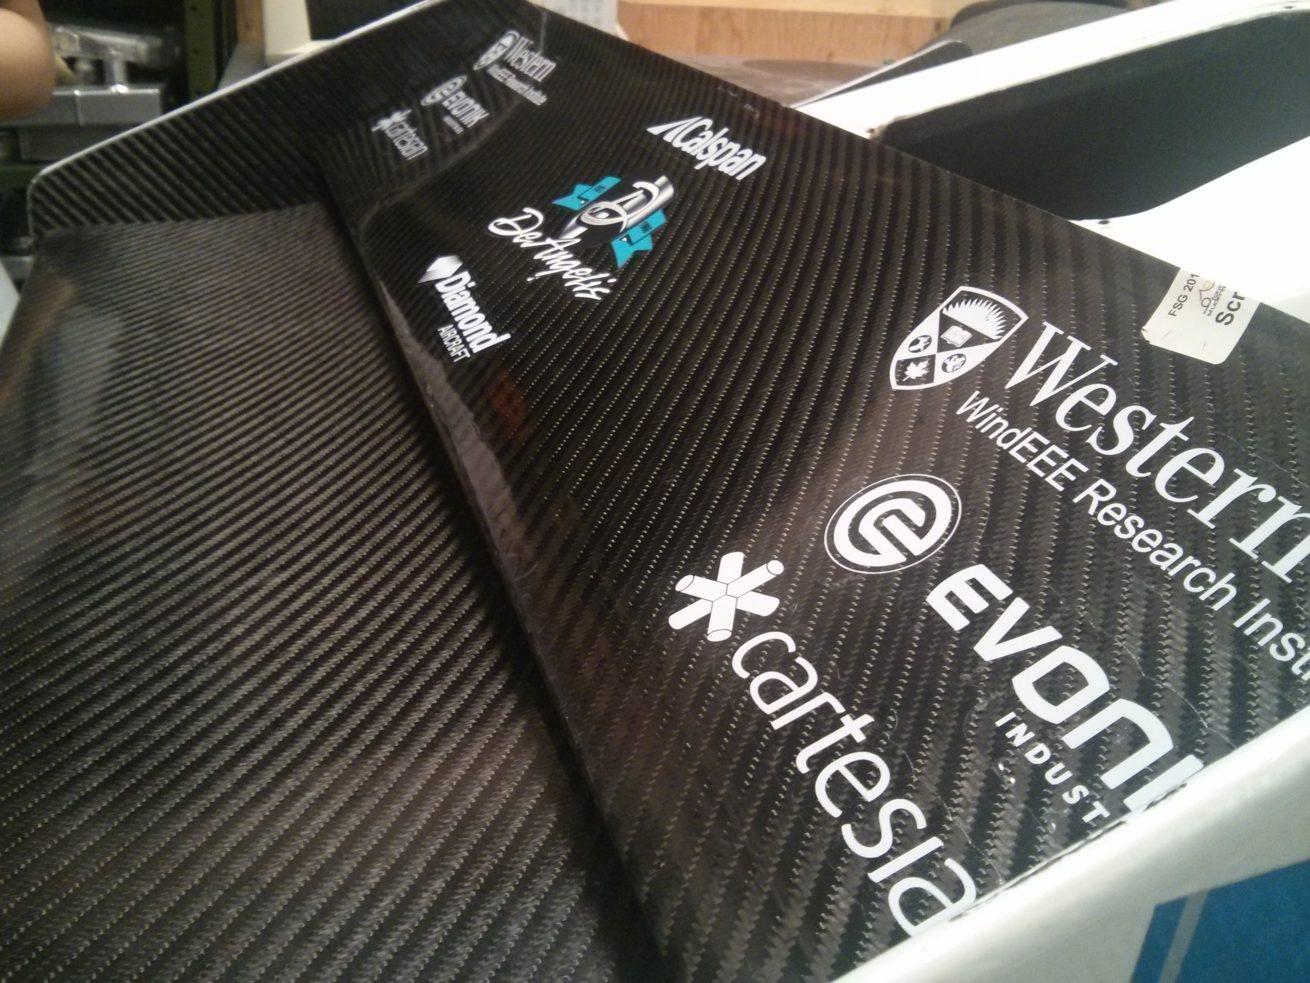 Closeup of sponsor decals